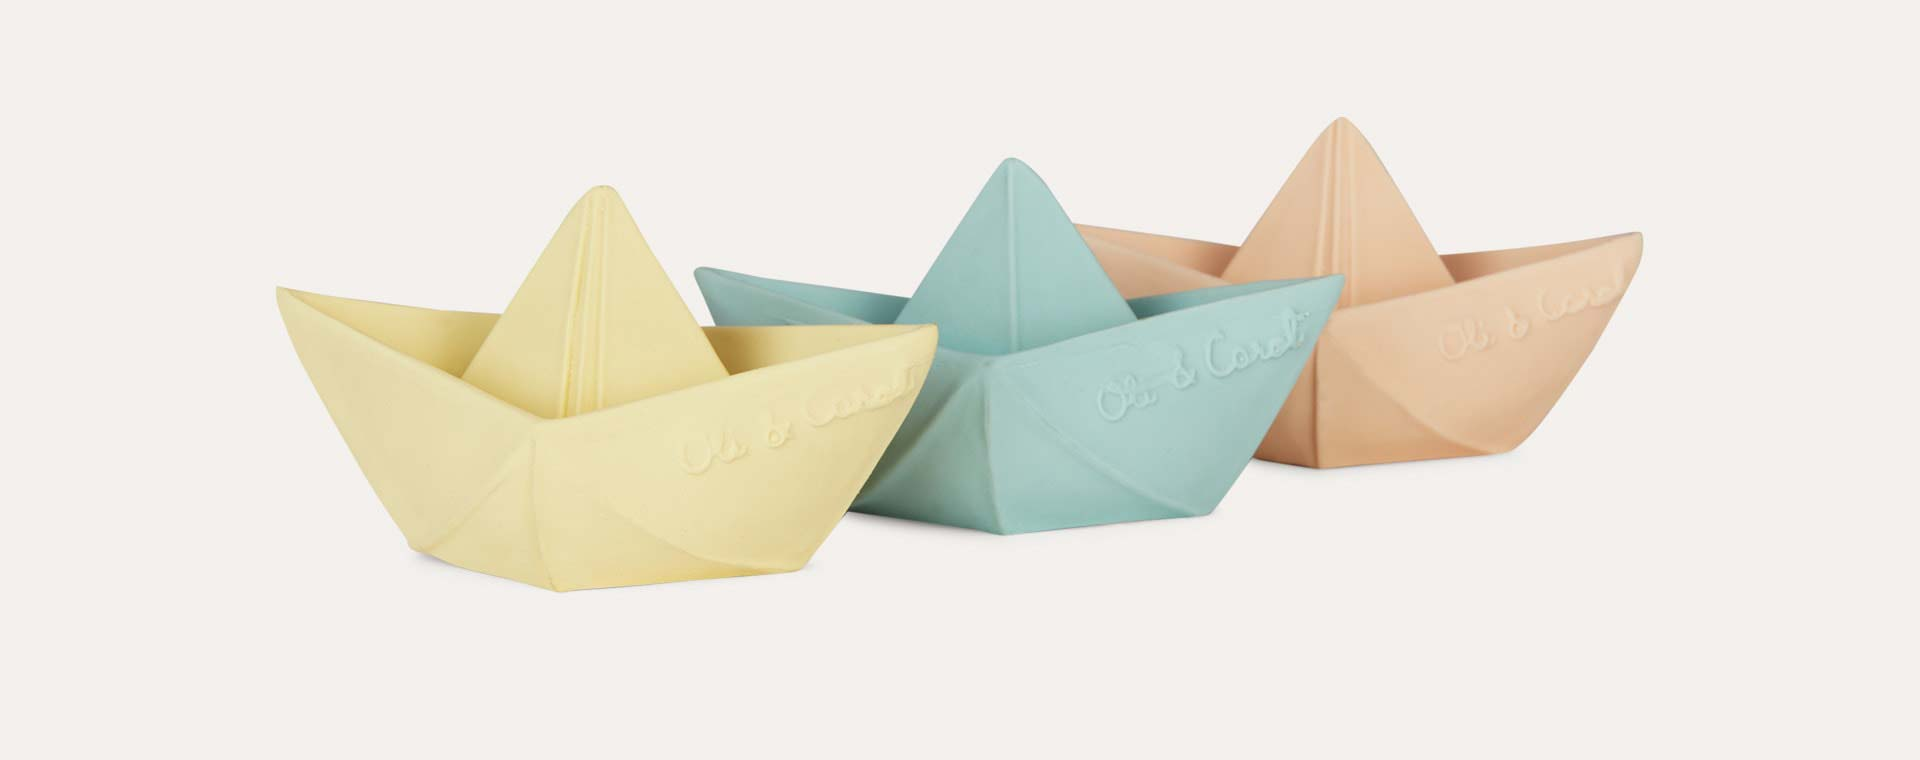 Buy The Oli Carol Origami Boat Bath Toy Tried Tested By KIDLY